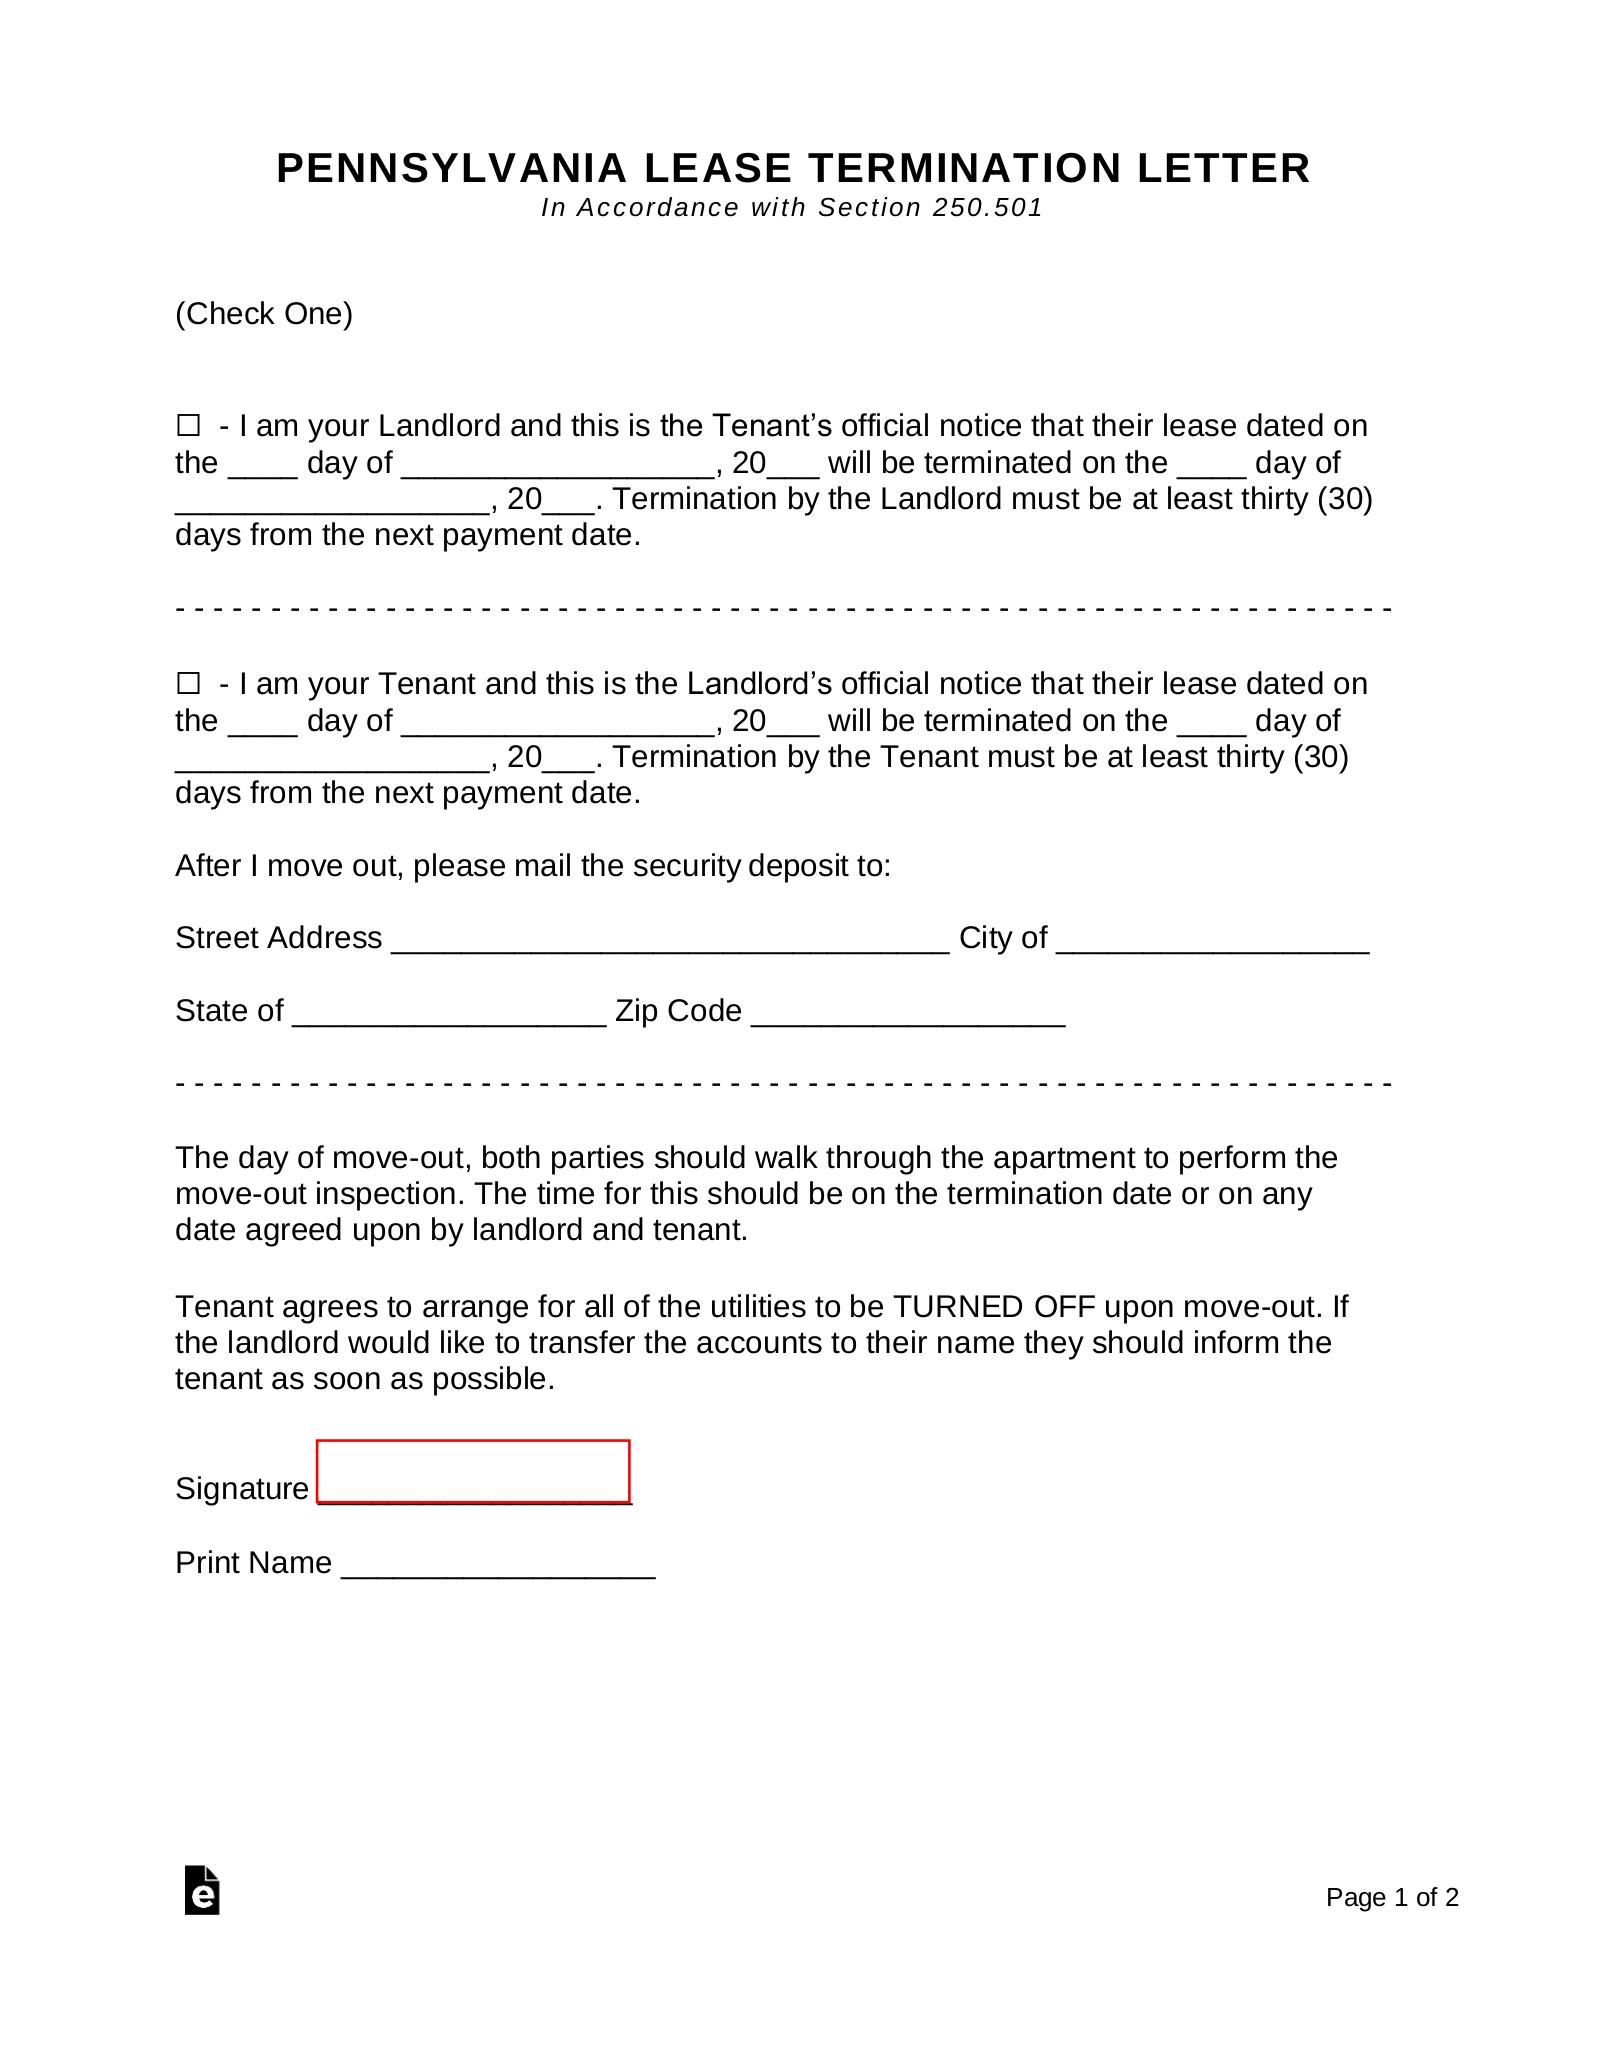 Free Pennsylvania Lease Termination Letter Form | 30 Days